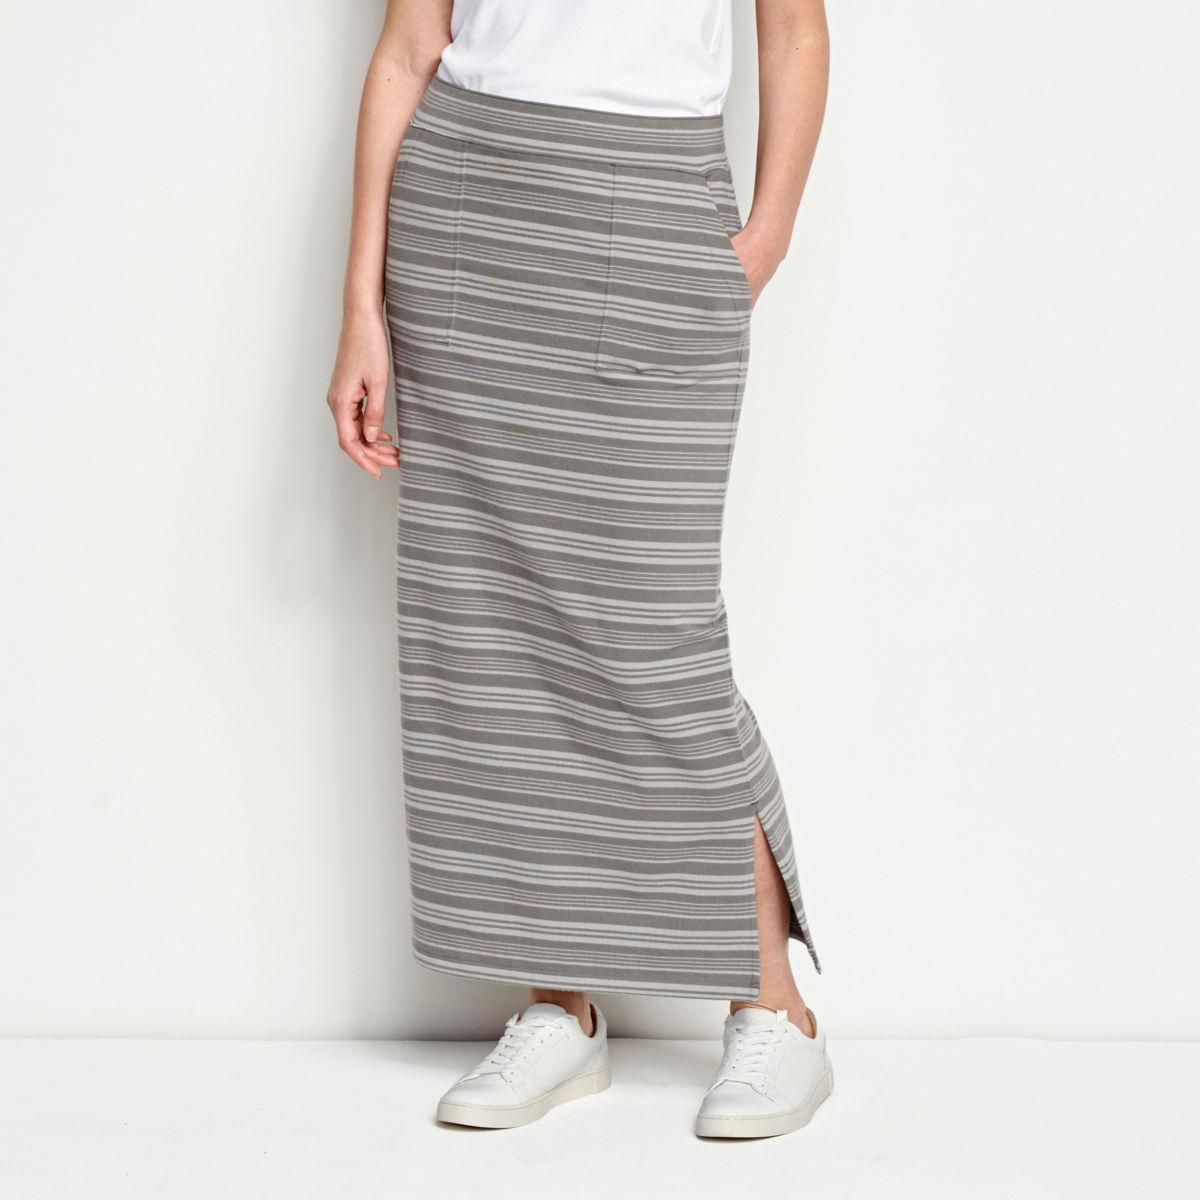 Sundown Striped Classic Cotton Skirt - image number 0